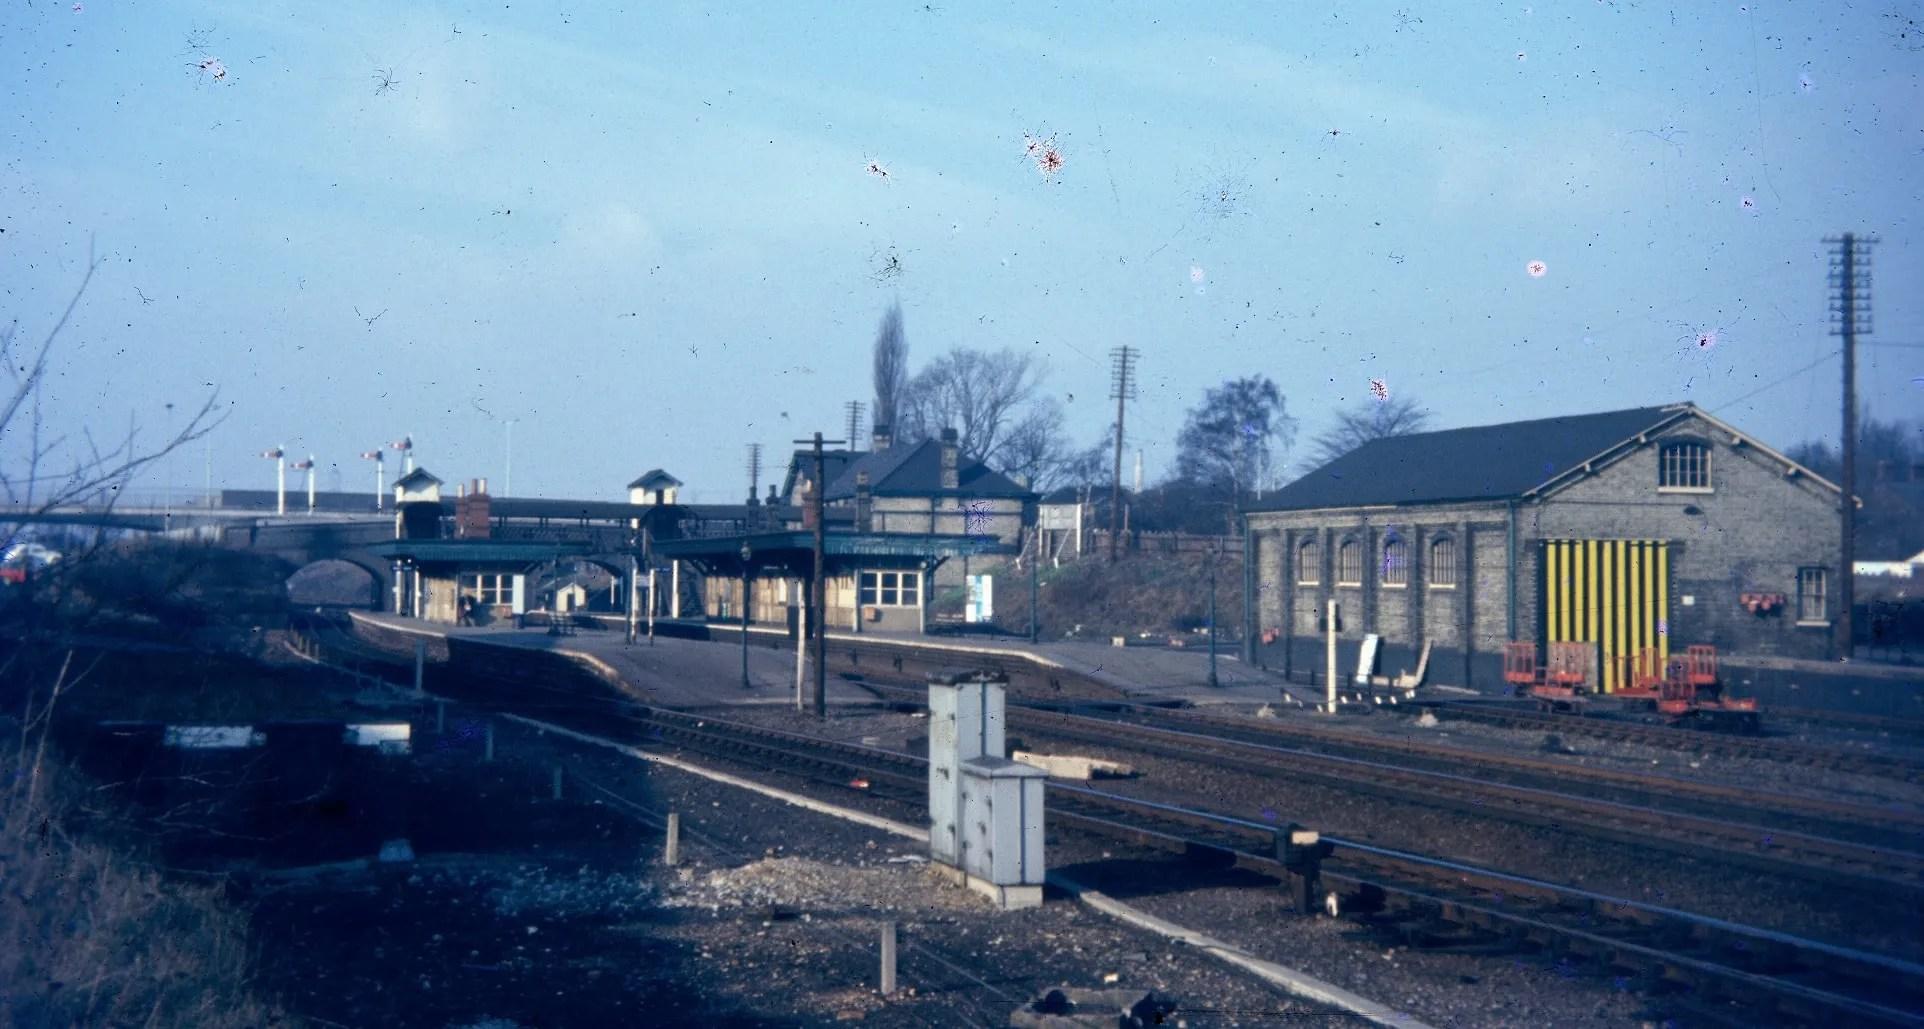 Old railway photo of Stevenage Railway Station